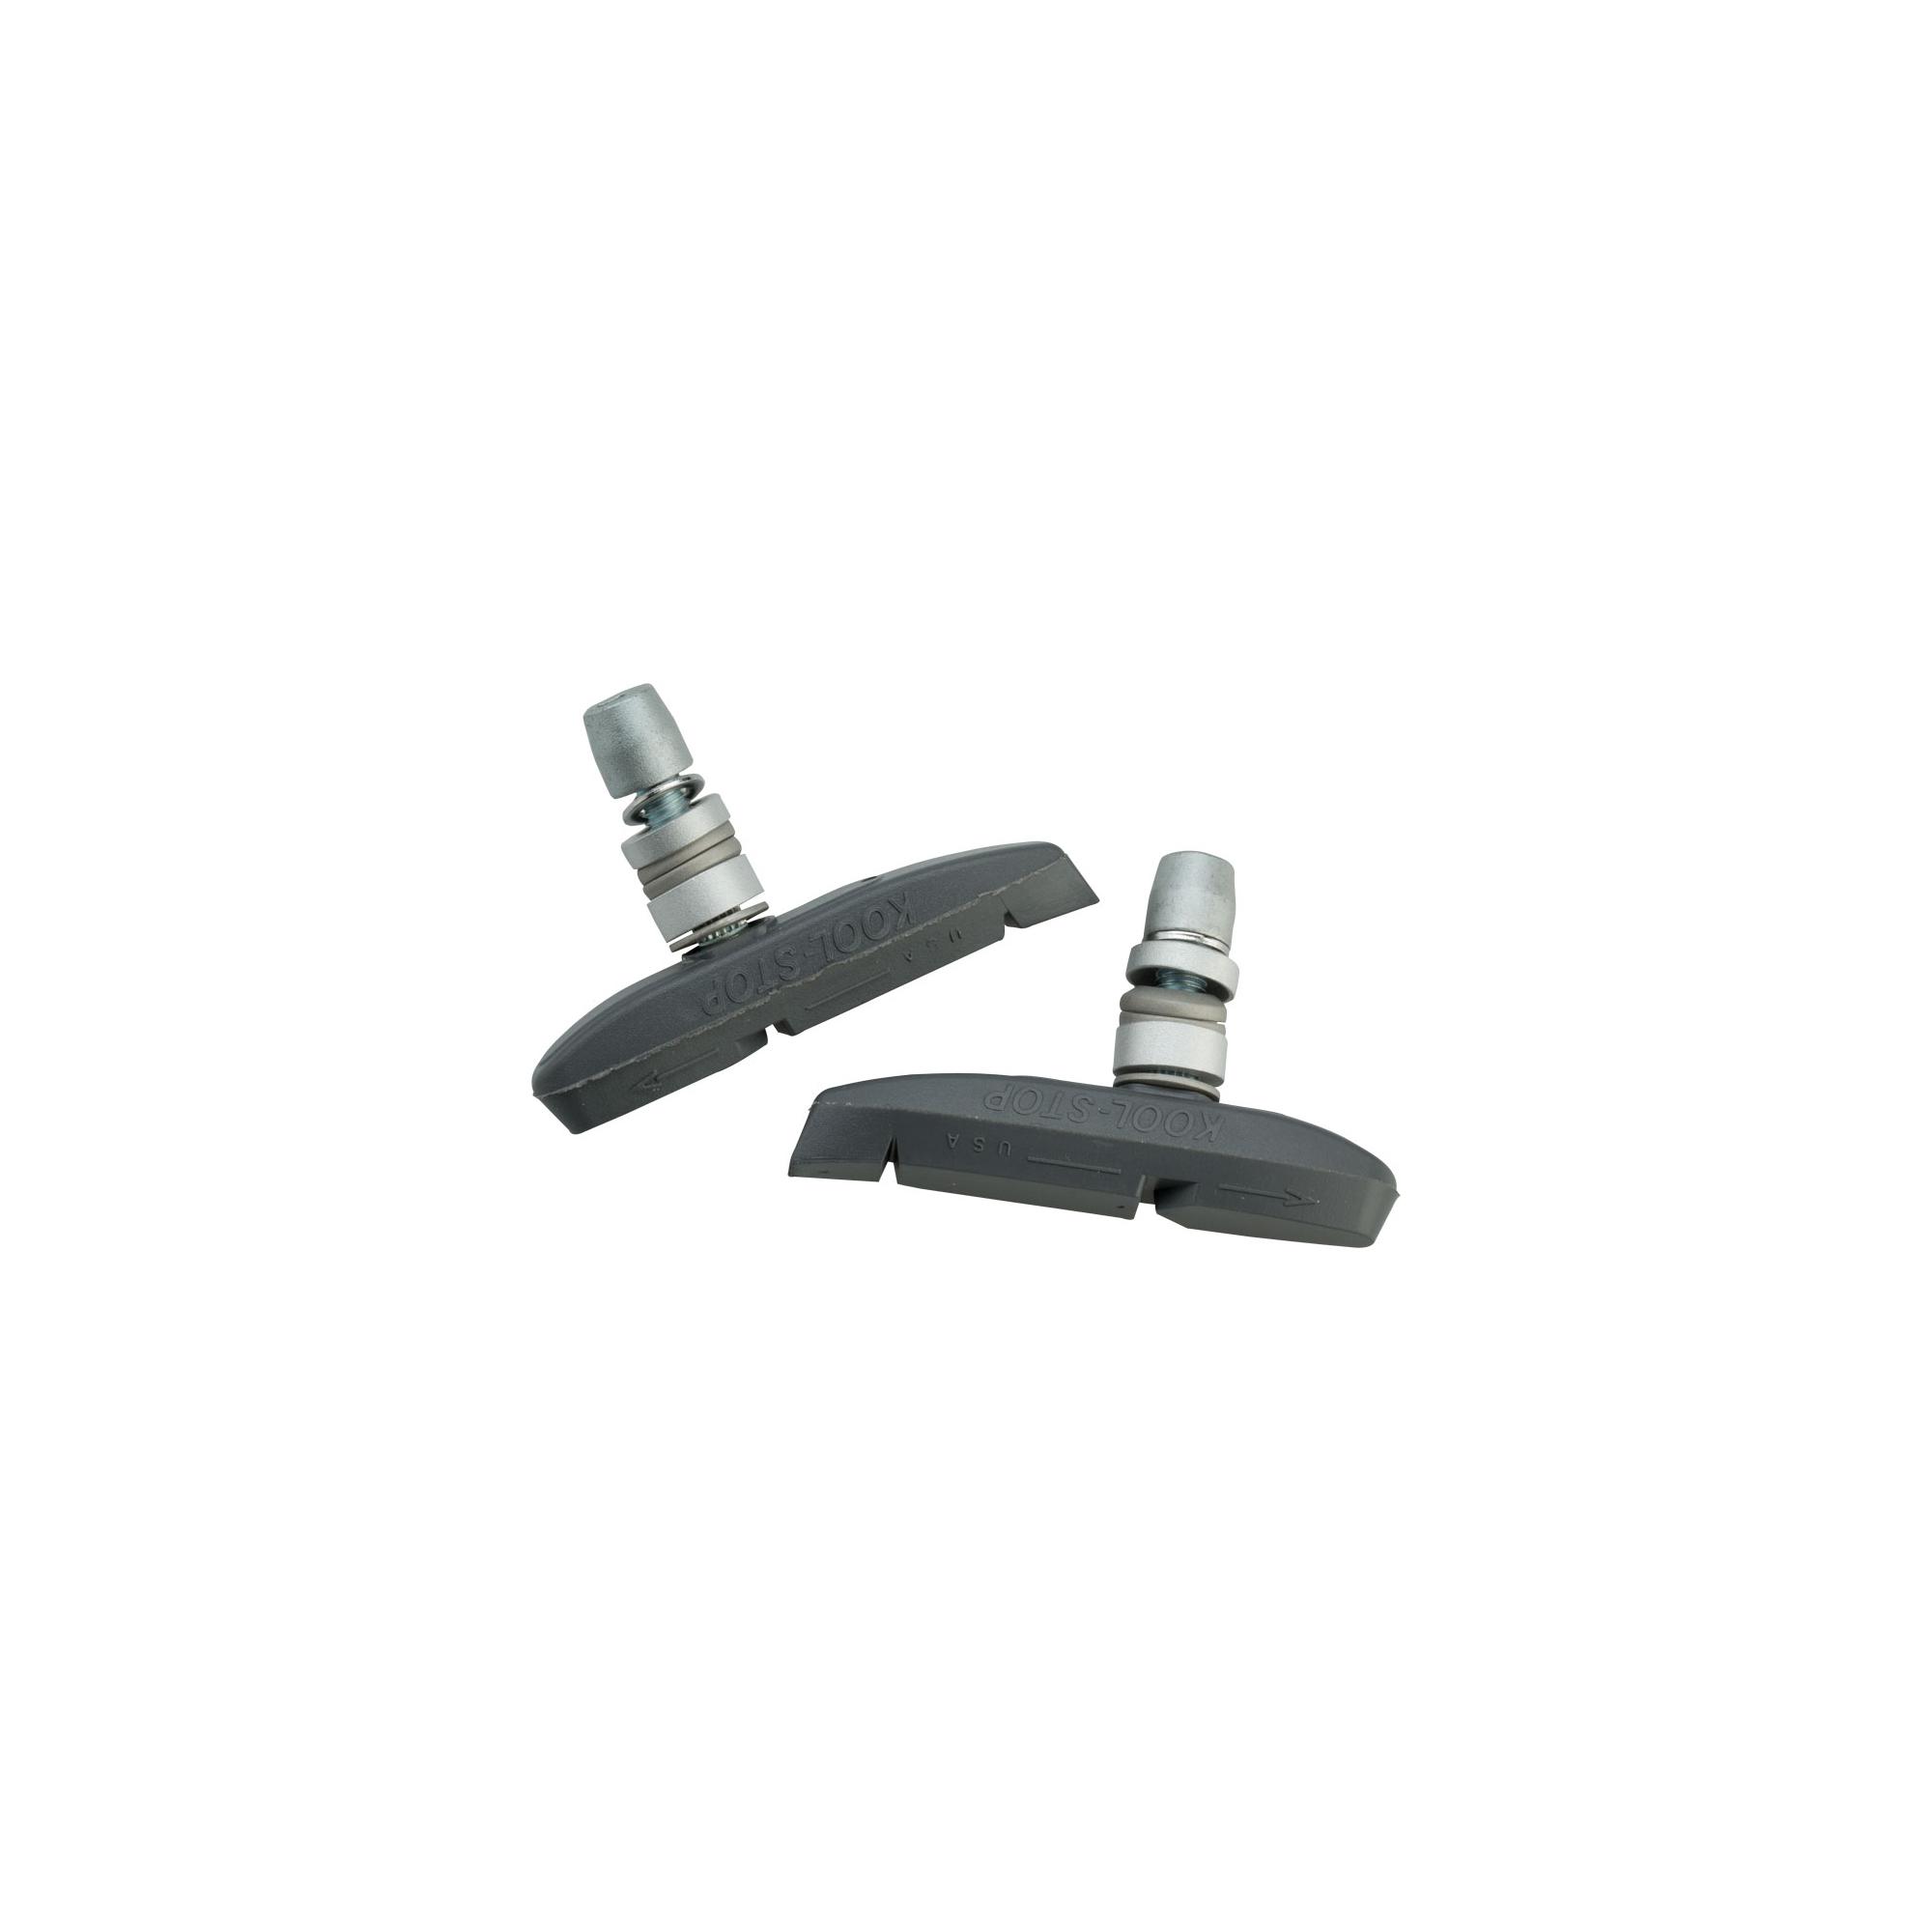 Kool-Stop Thinline Brake Pad Hardware Kit For 1 Pair of Pads